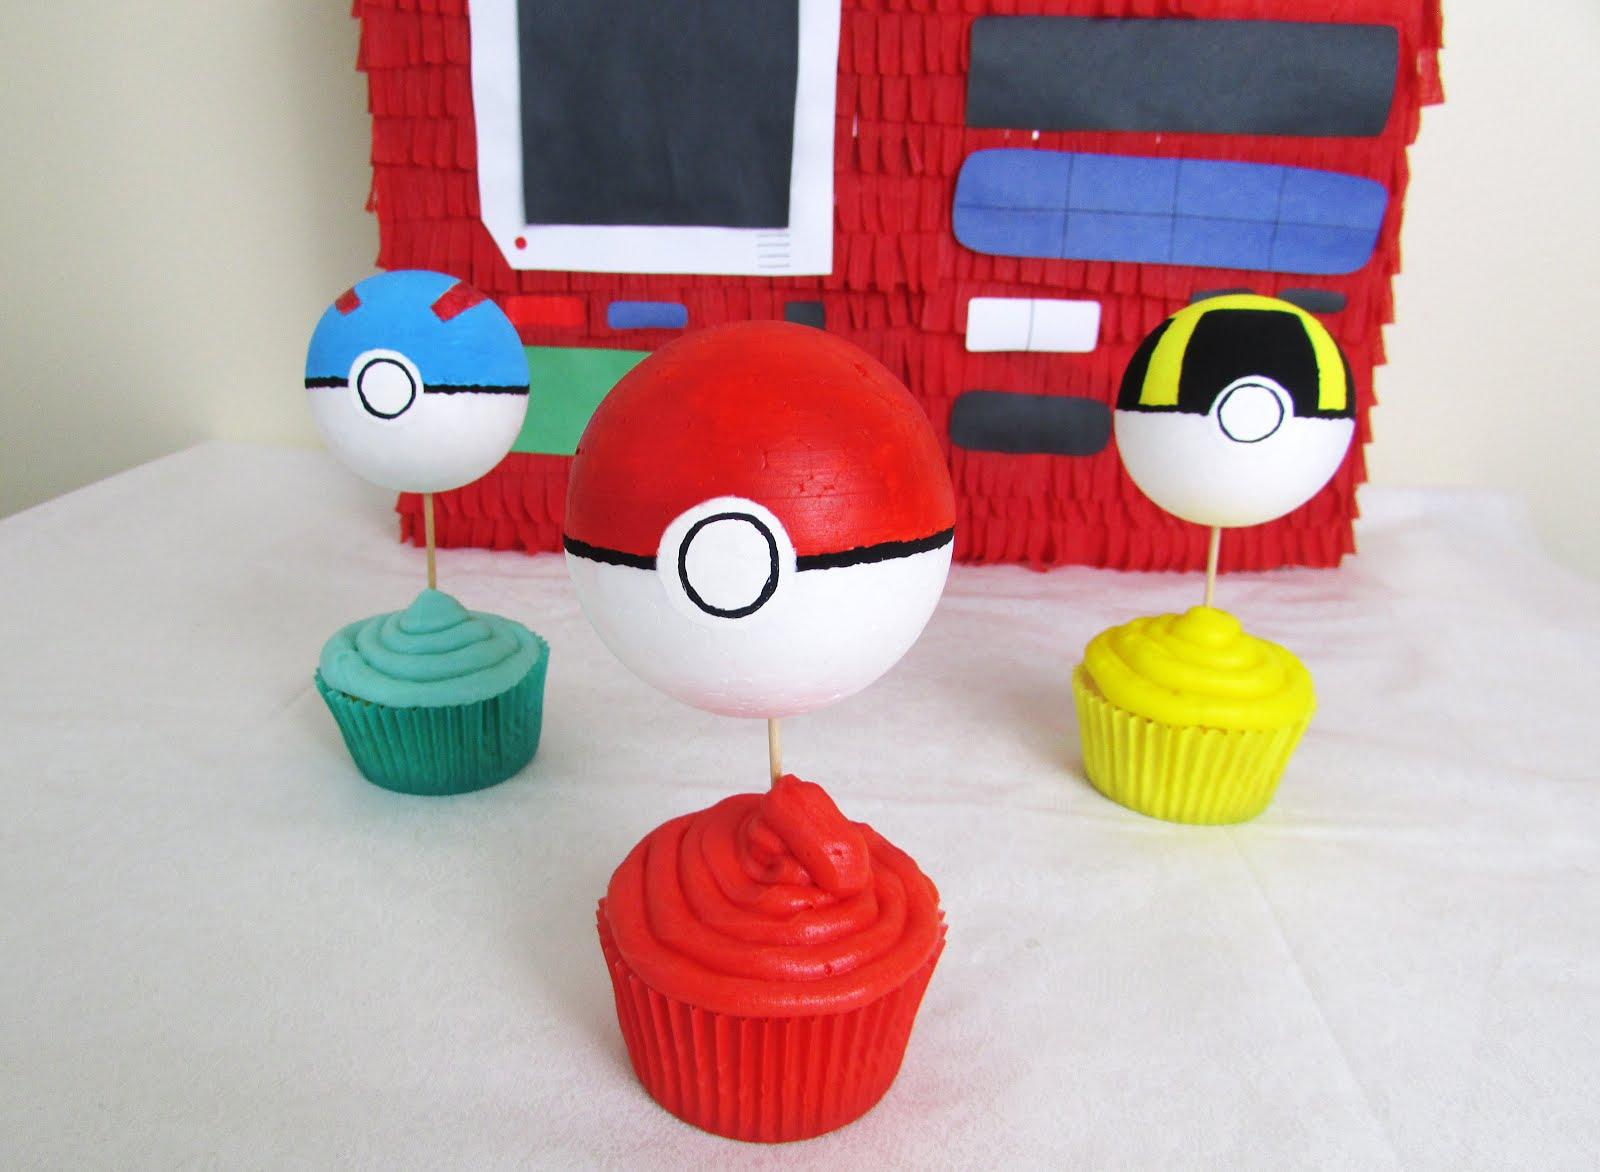 DIY Poké Ball Cupcake Toppers for Pokémon Day